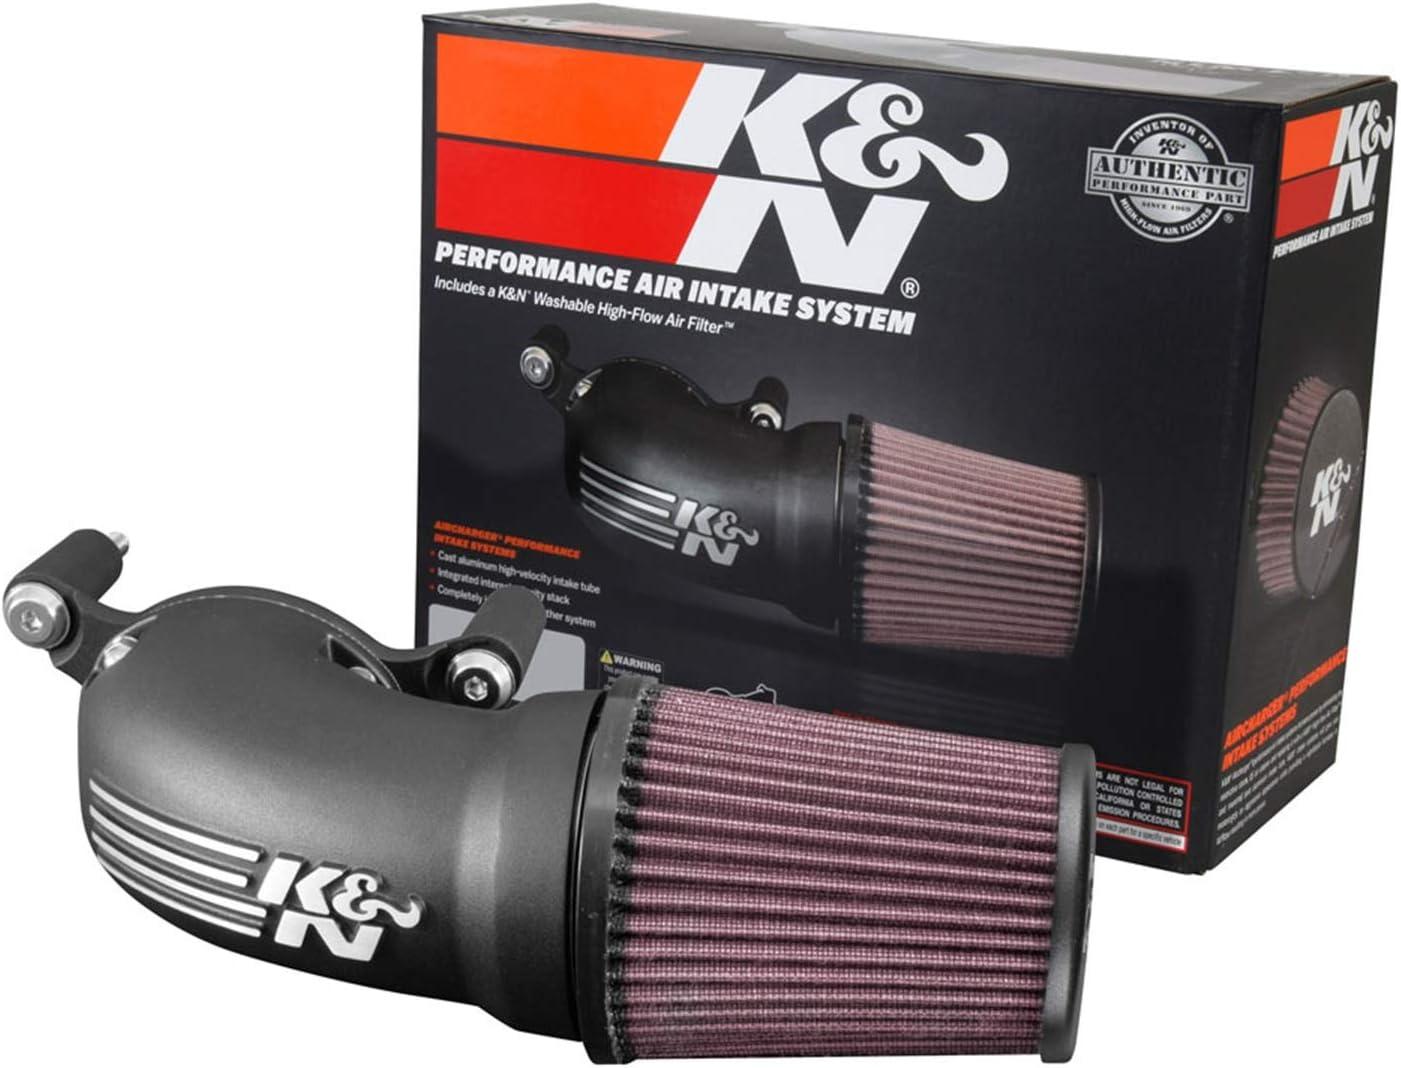 K/&N 57-1134 P Performance Air Intake System